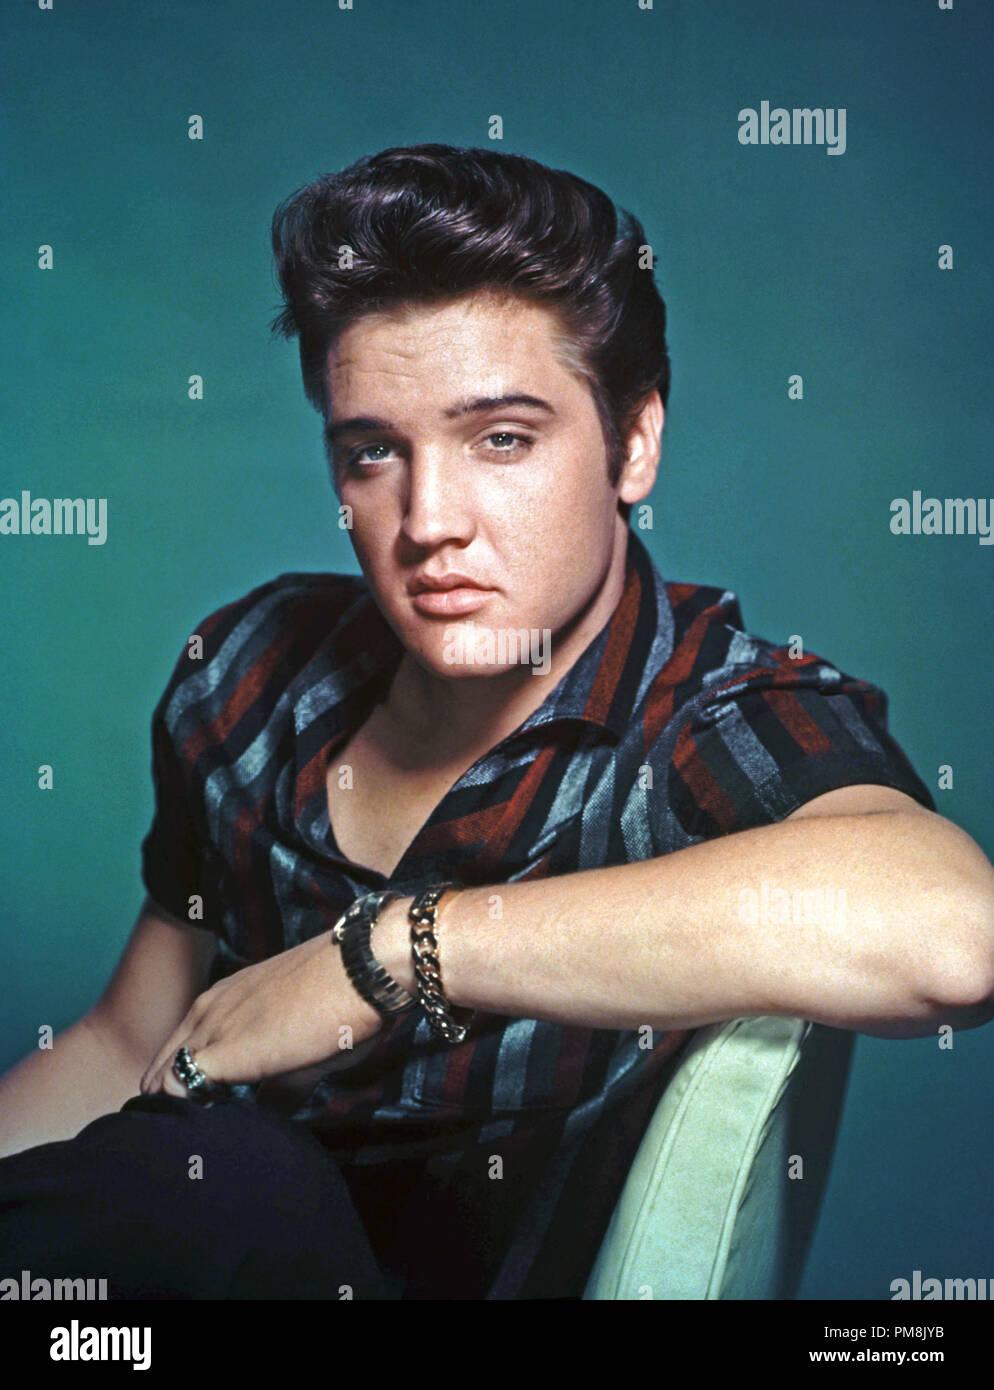 (Archival Classic Cinema - Elvis Presley Retrospective) Elvis Presley, circa 1957.  File Reference # 31616_067THA - Stock Image